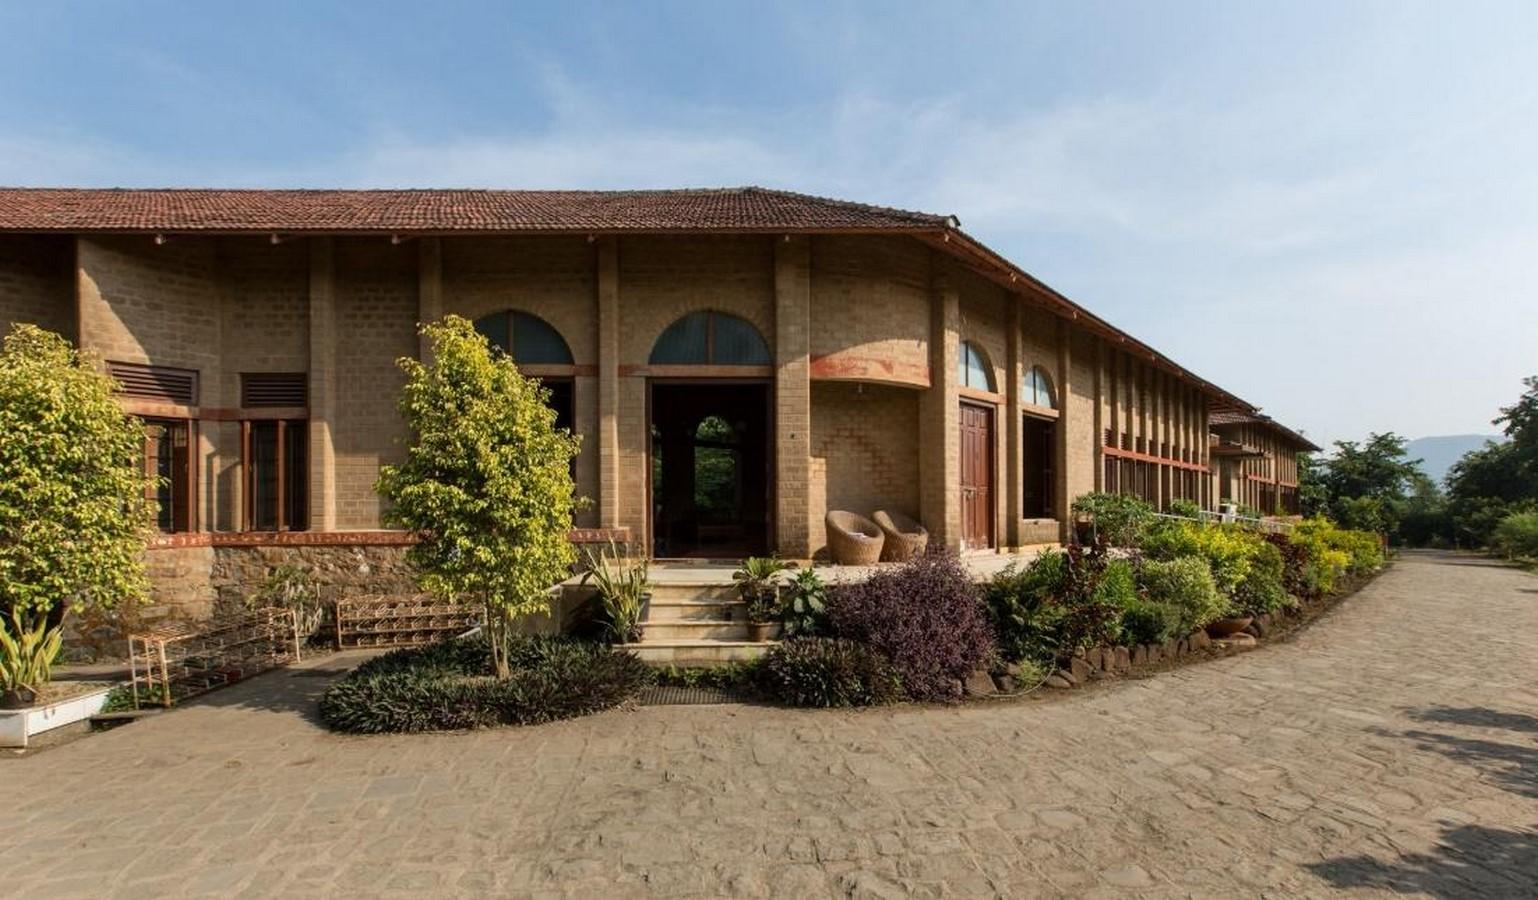 Govardhan Eco Village by Chitra Vishwanath: A Retreat for the Devotees - Sheet2